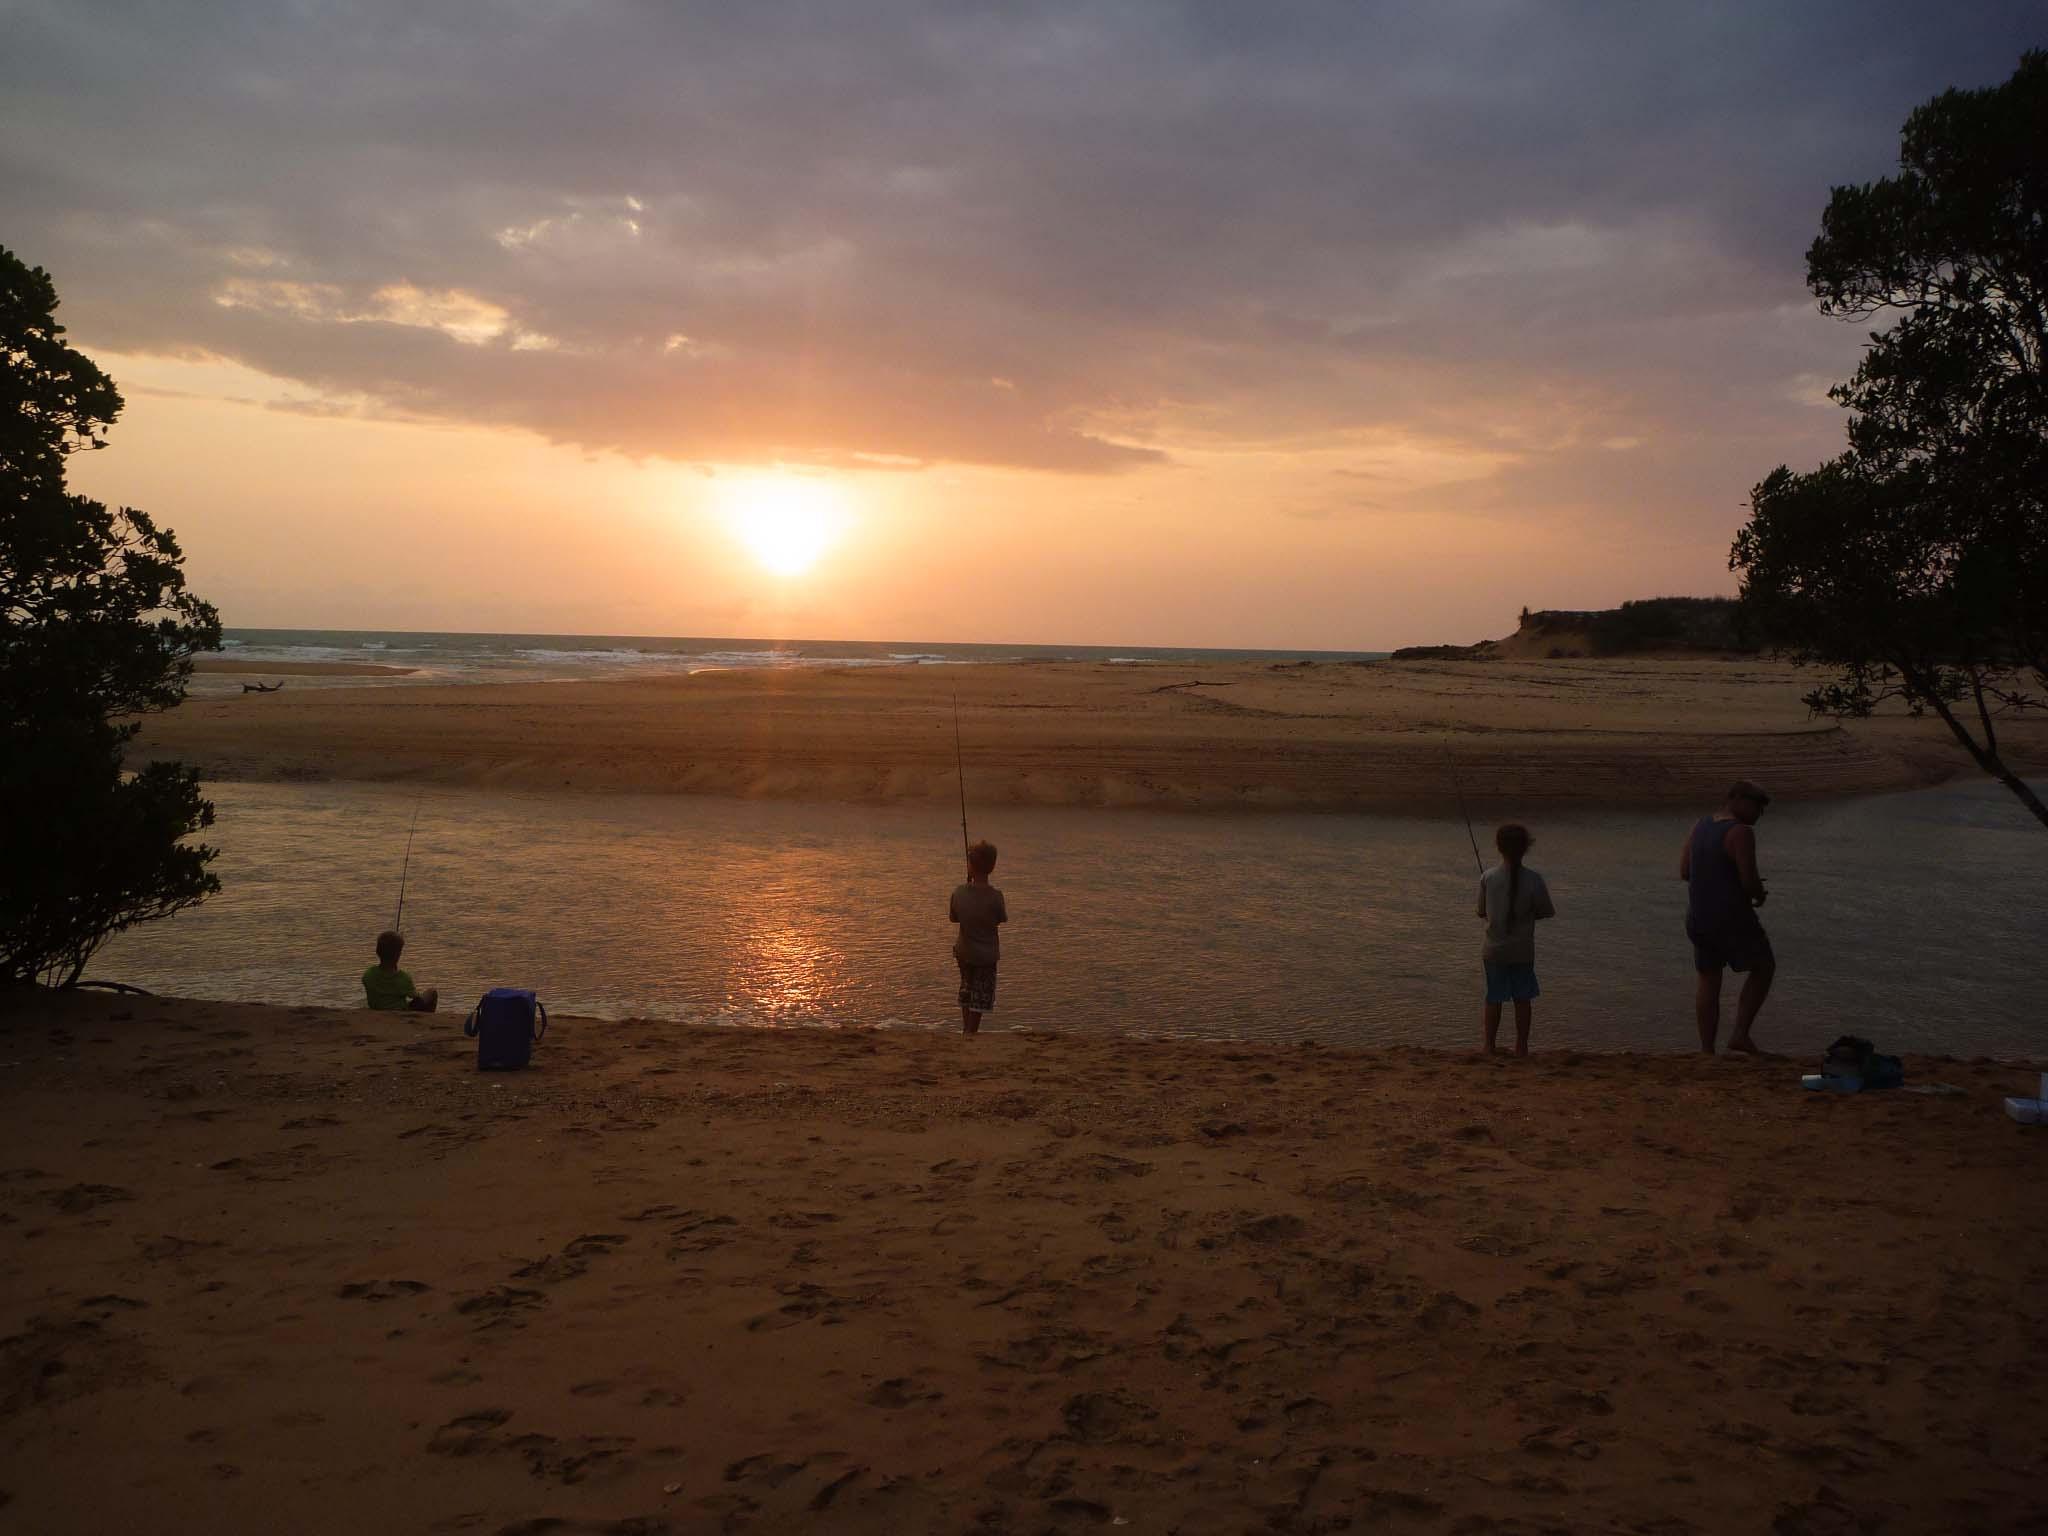 Tidal river at sunset